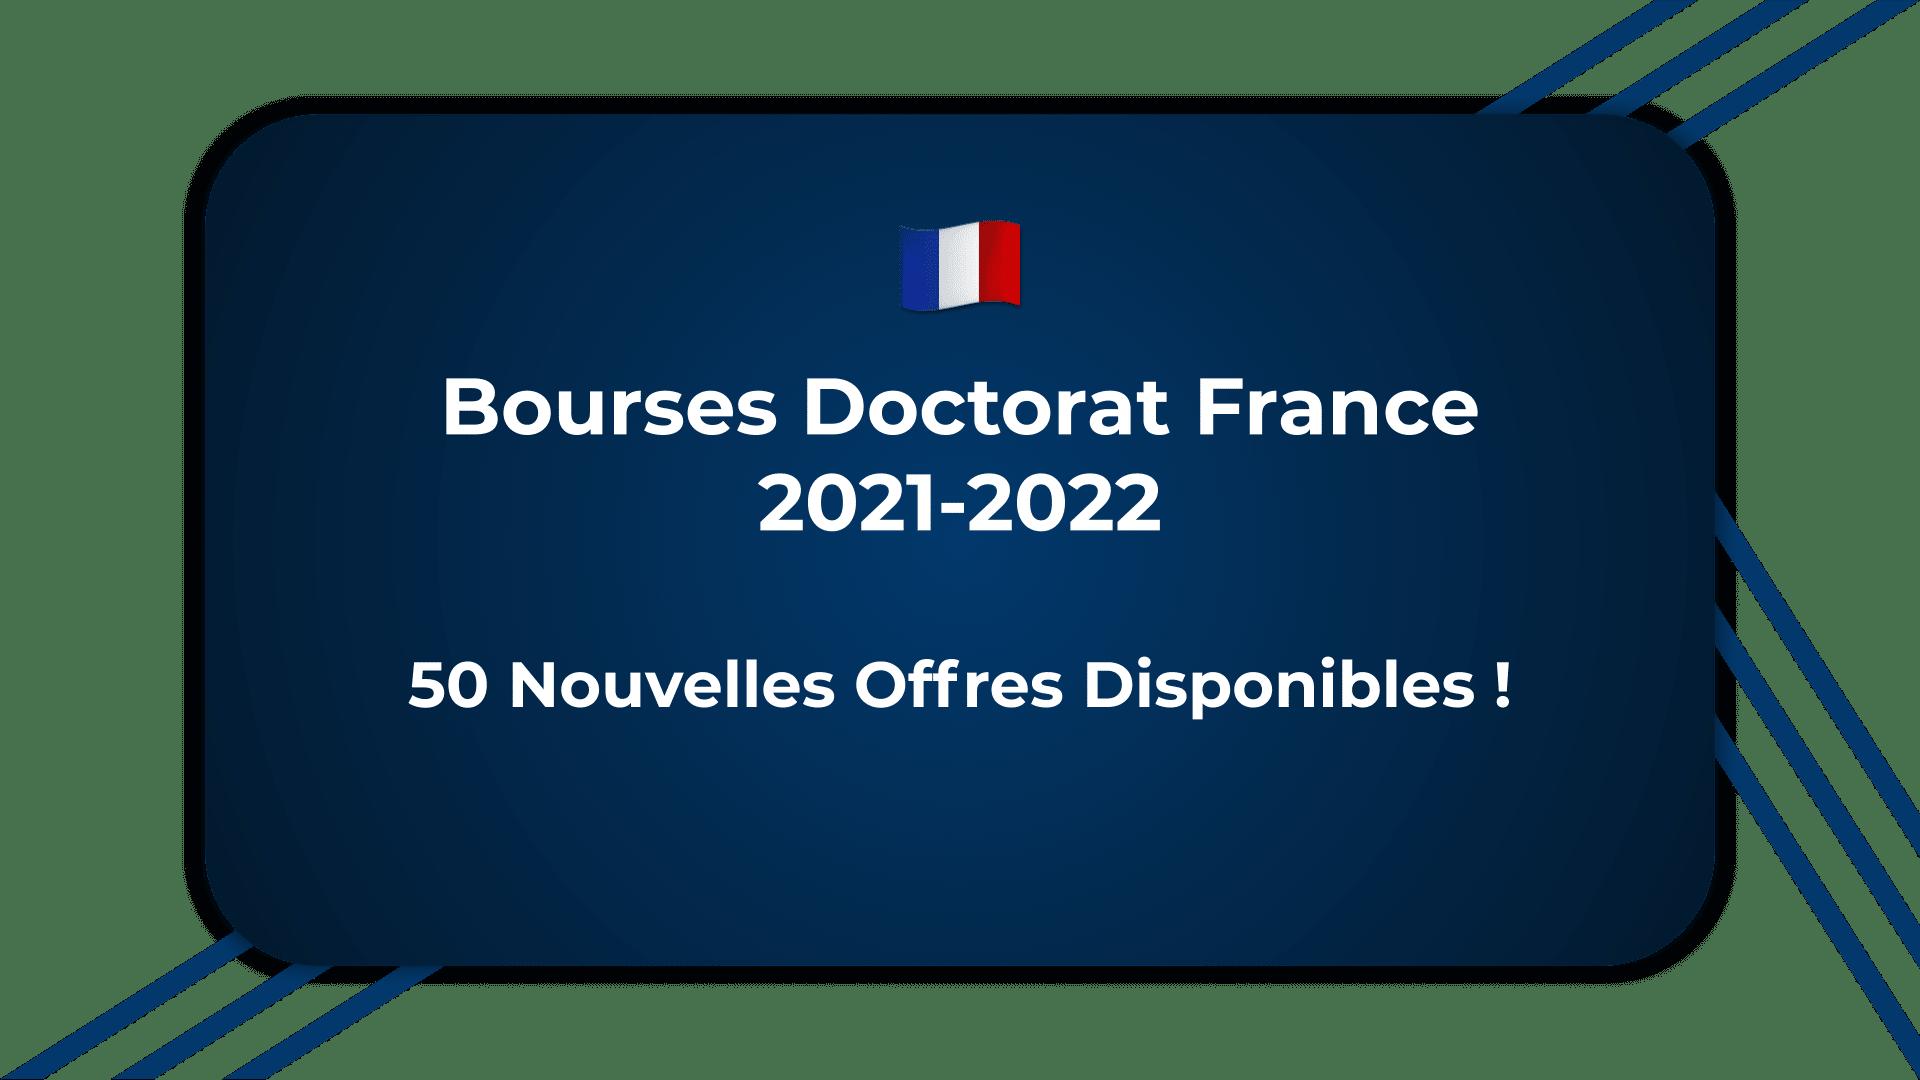 Bourses Doctorat France